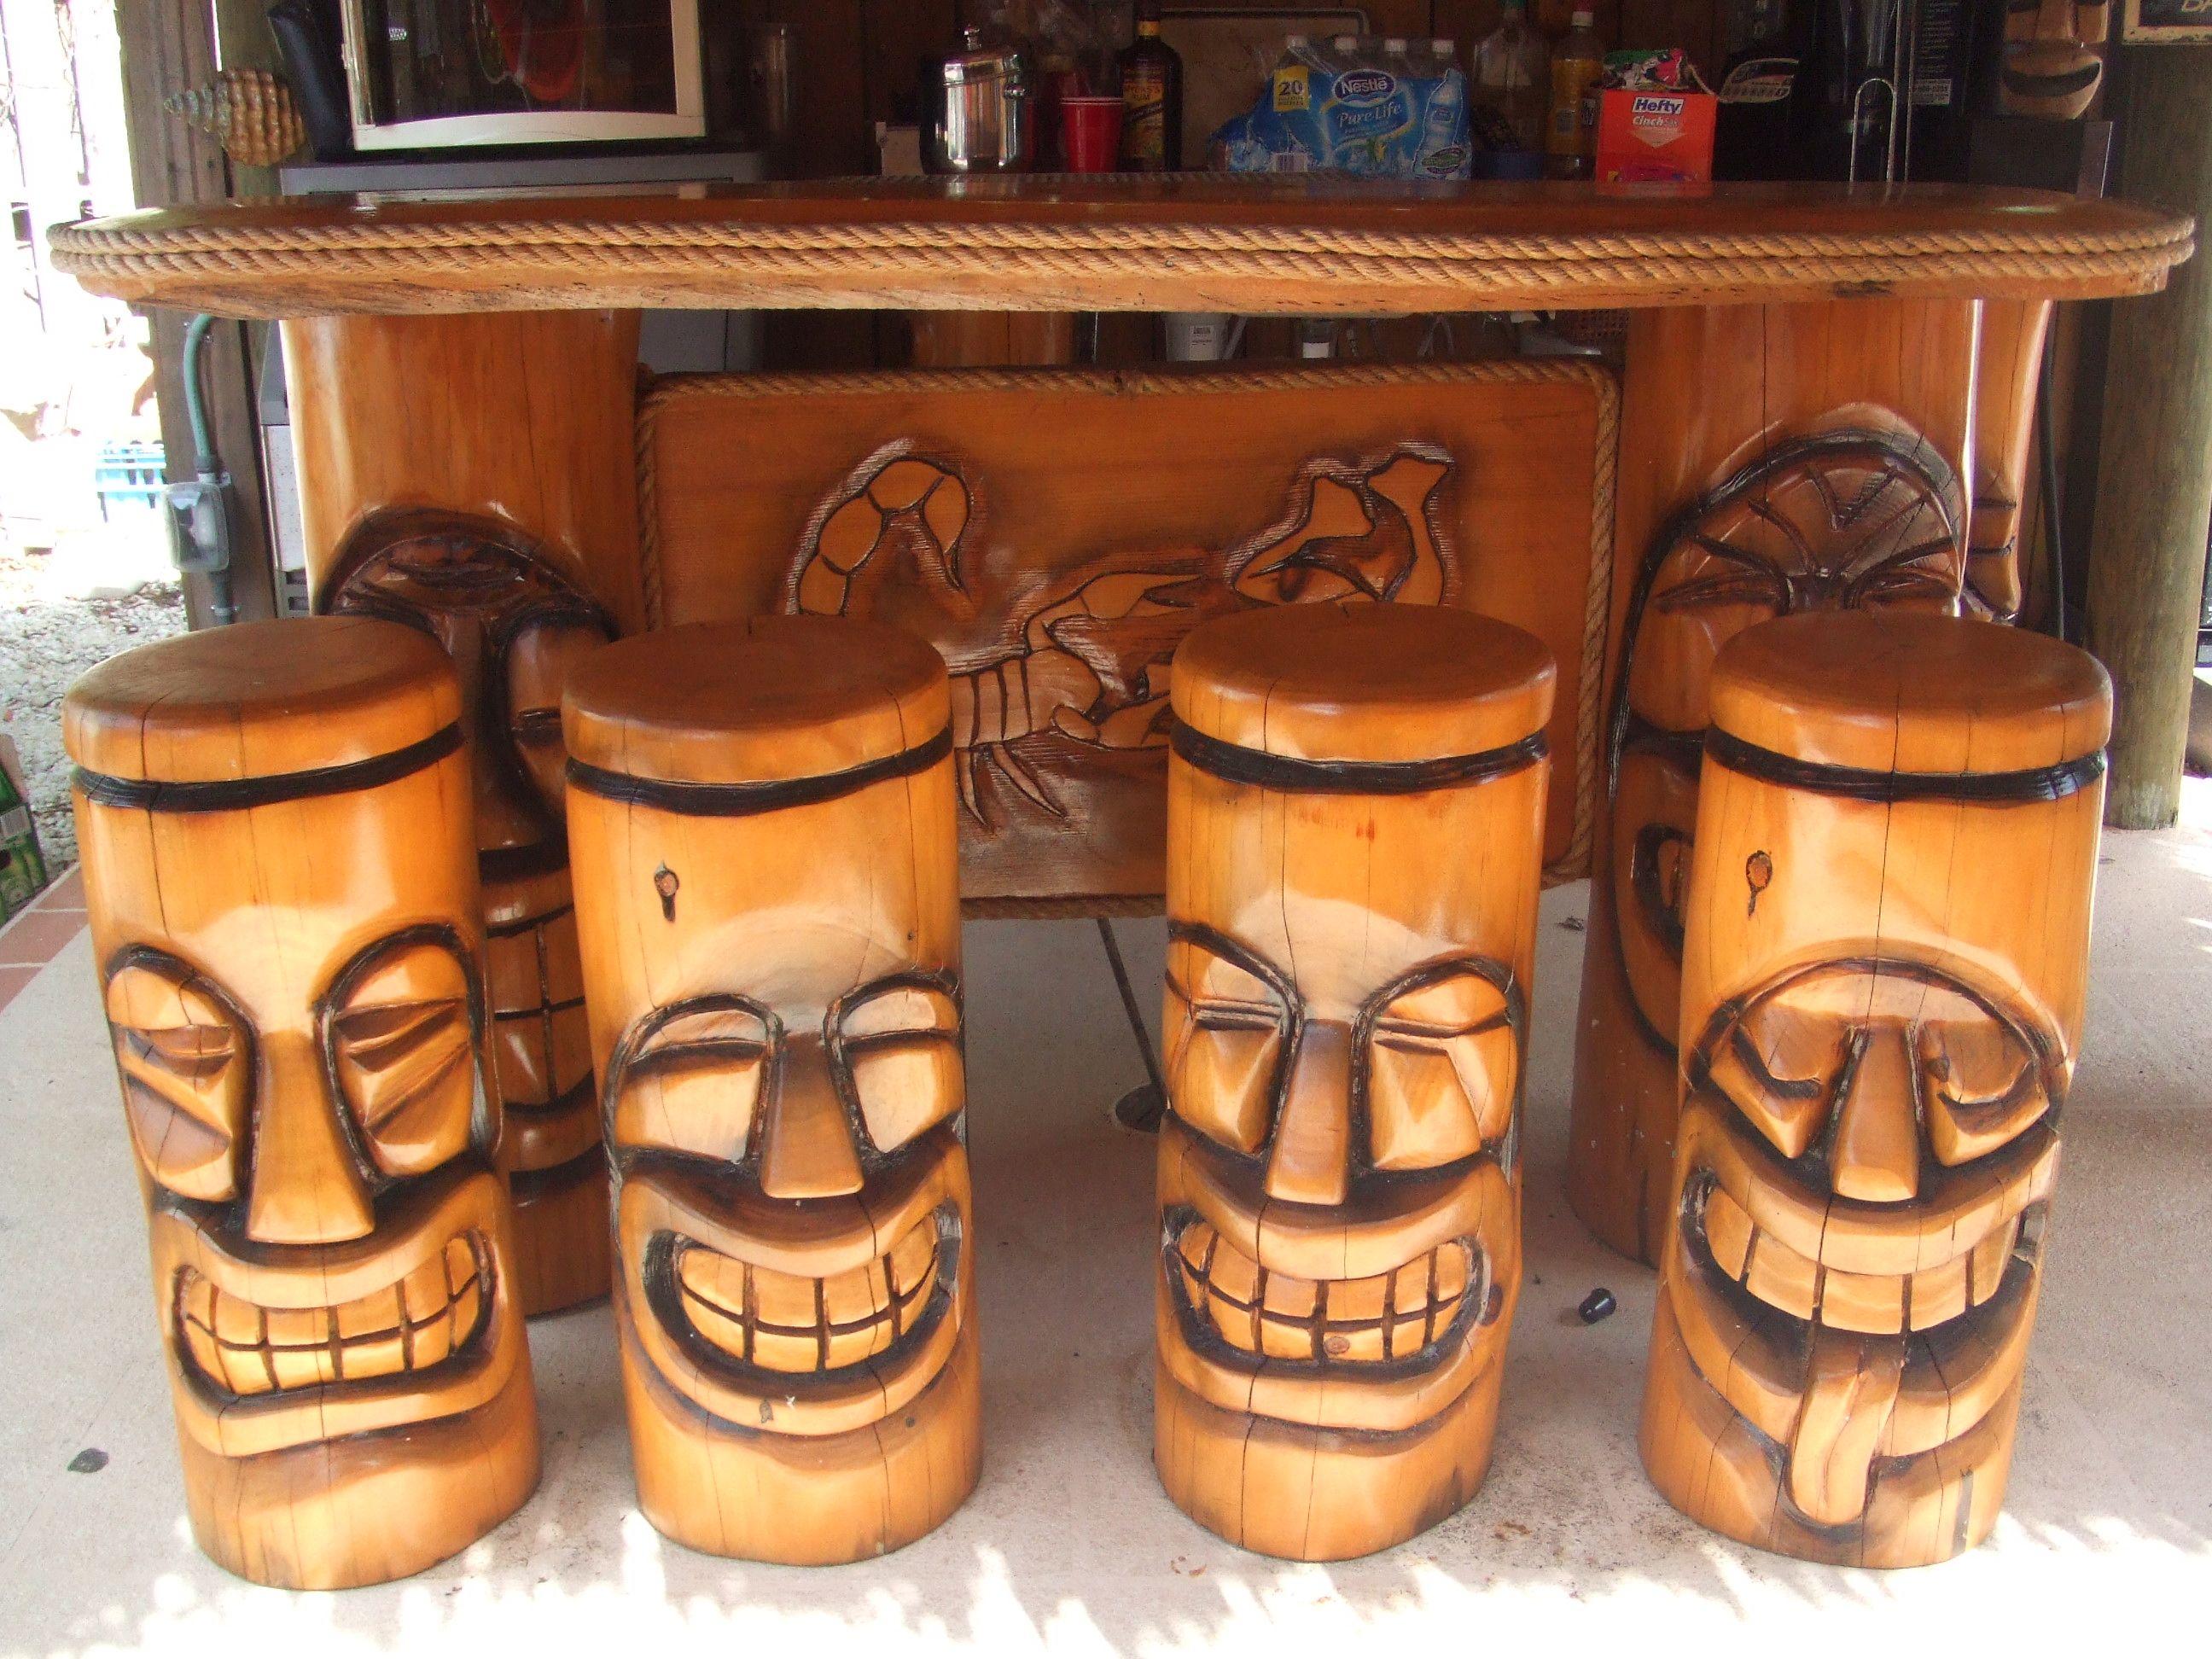 polynesian tiki bar stools tiki tiki tiki bar stools bar stools rh pinterest com Easy to Build Tiki Bar Small Outdoor Bar for Sale